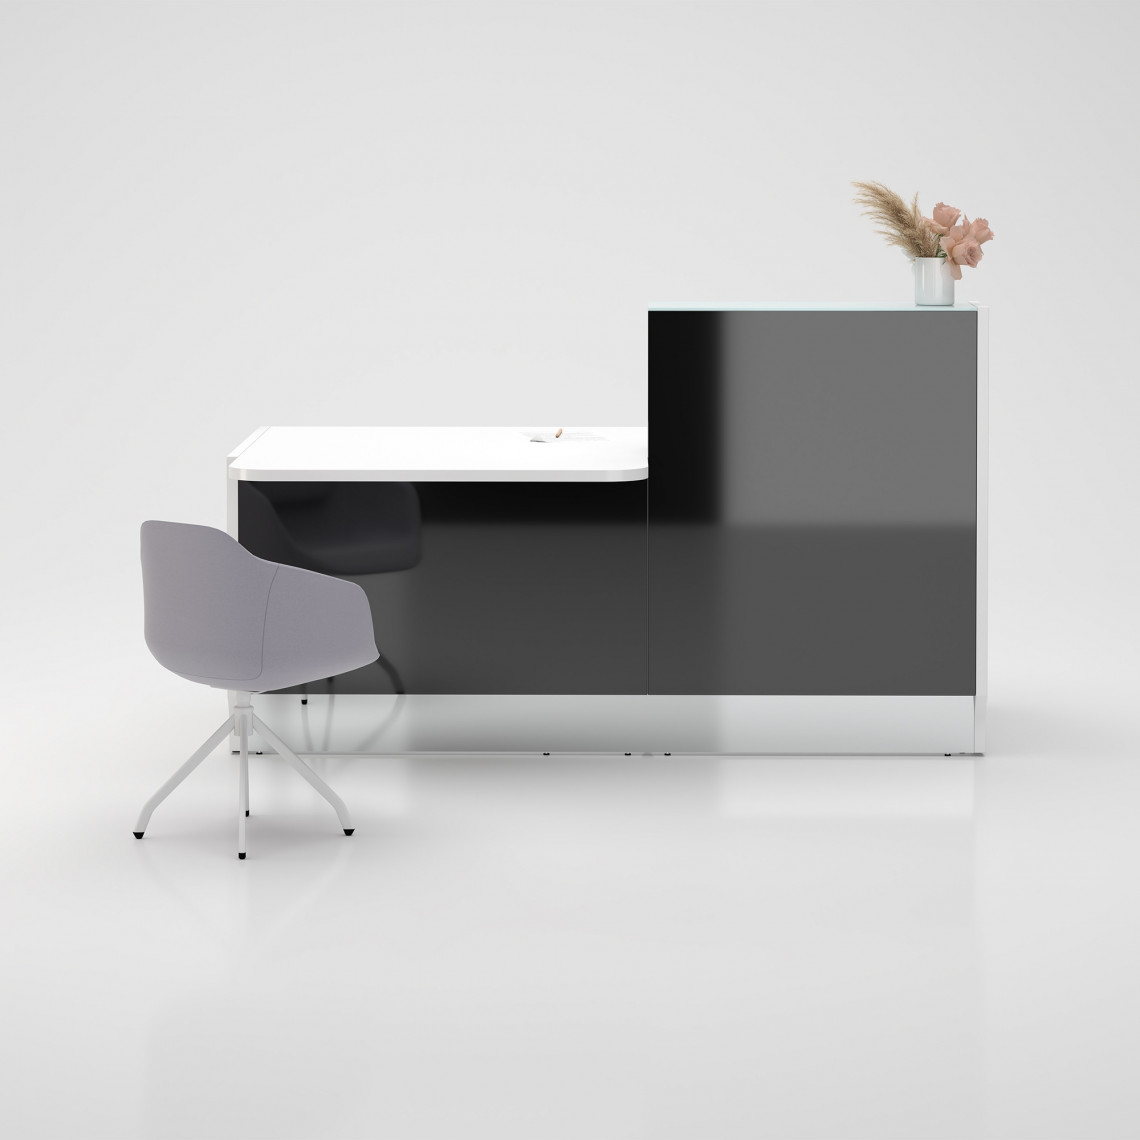 Receptionsdisk Linea Modell 6